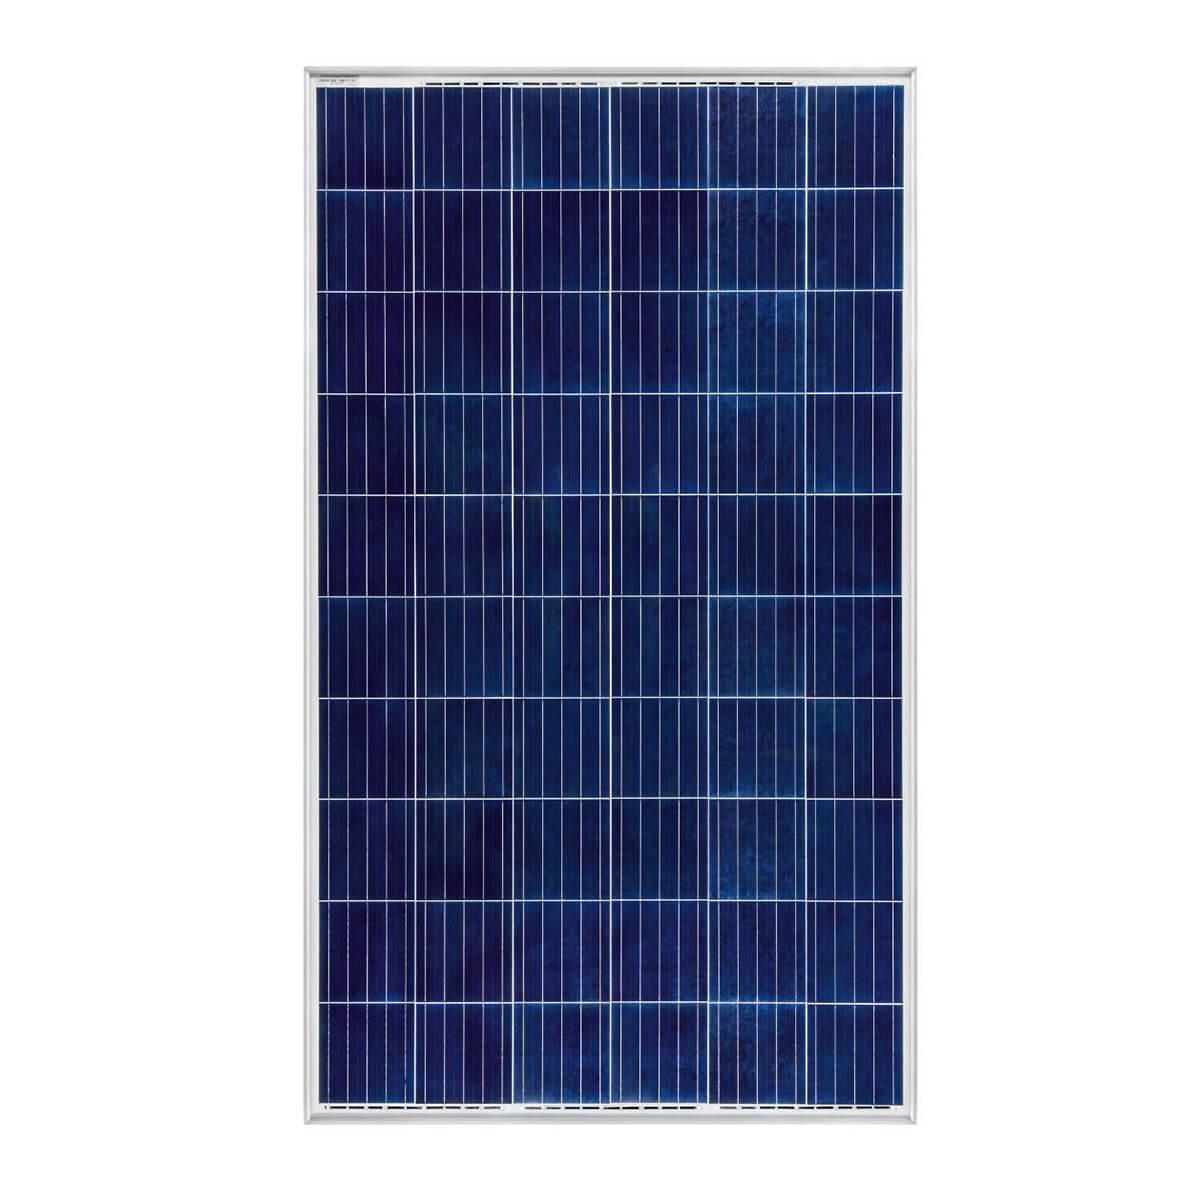 Odul solar 280W panel, odul solar 280Watt panel, Odul solar 280 W panel, odul solar 280 Watt panel, odul solar 280 Watt polikristal panel, Odul solar 280 W watt gunes paneli, odul solar 280 W watt polikristal gunes paneli, odul solar 280 W Watt fotovoltaik polikristal solar panel, odul solar 280W polikristal gunes enerjisi, odul solar OSPp60-280W panel, ÖDÜL SOLAR 280 WATT